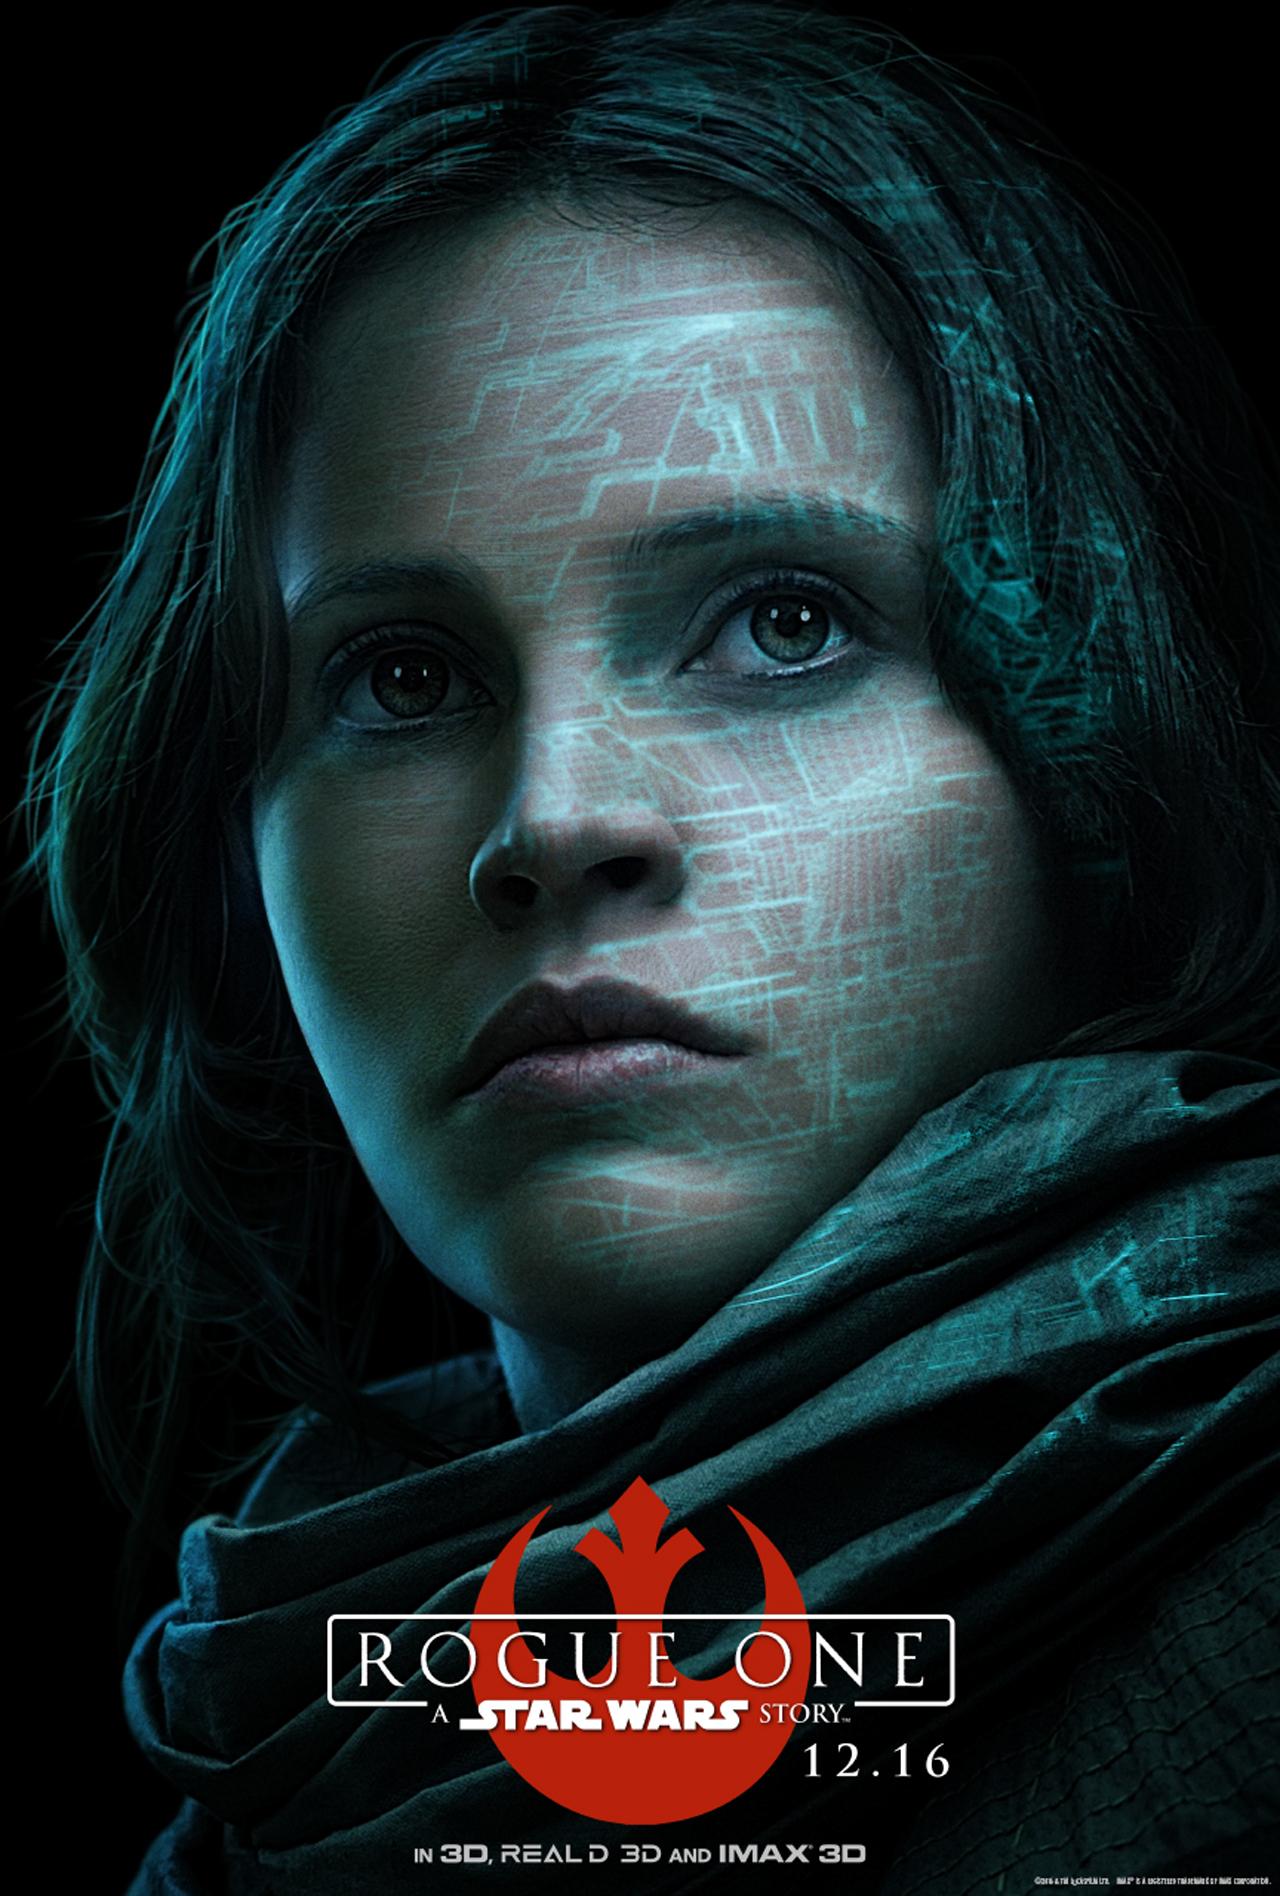 Rogue One: A Star Wars Story - Jyn Erso (Felicity Jones)